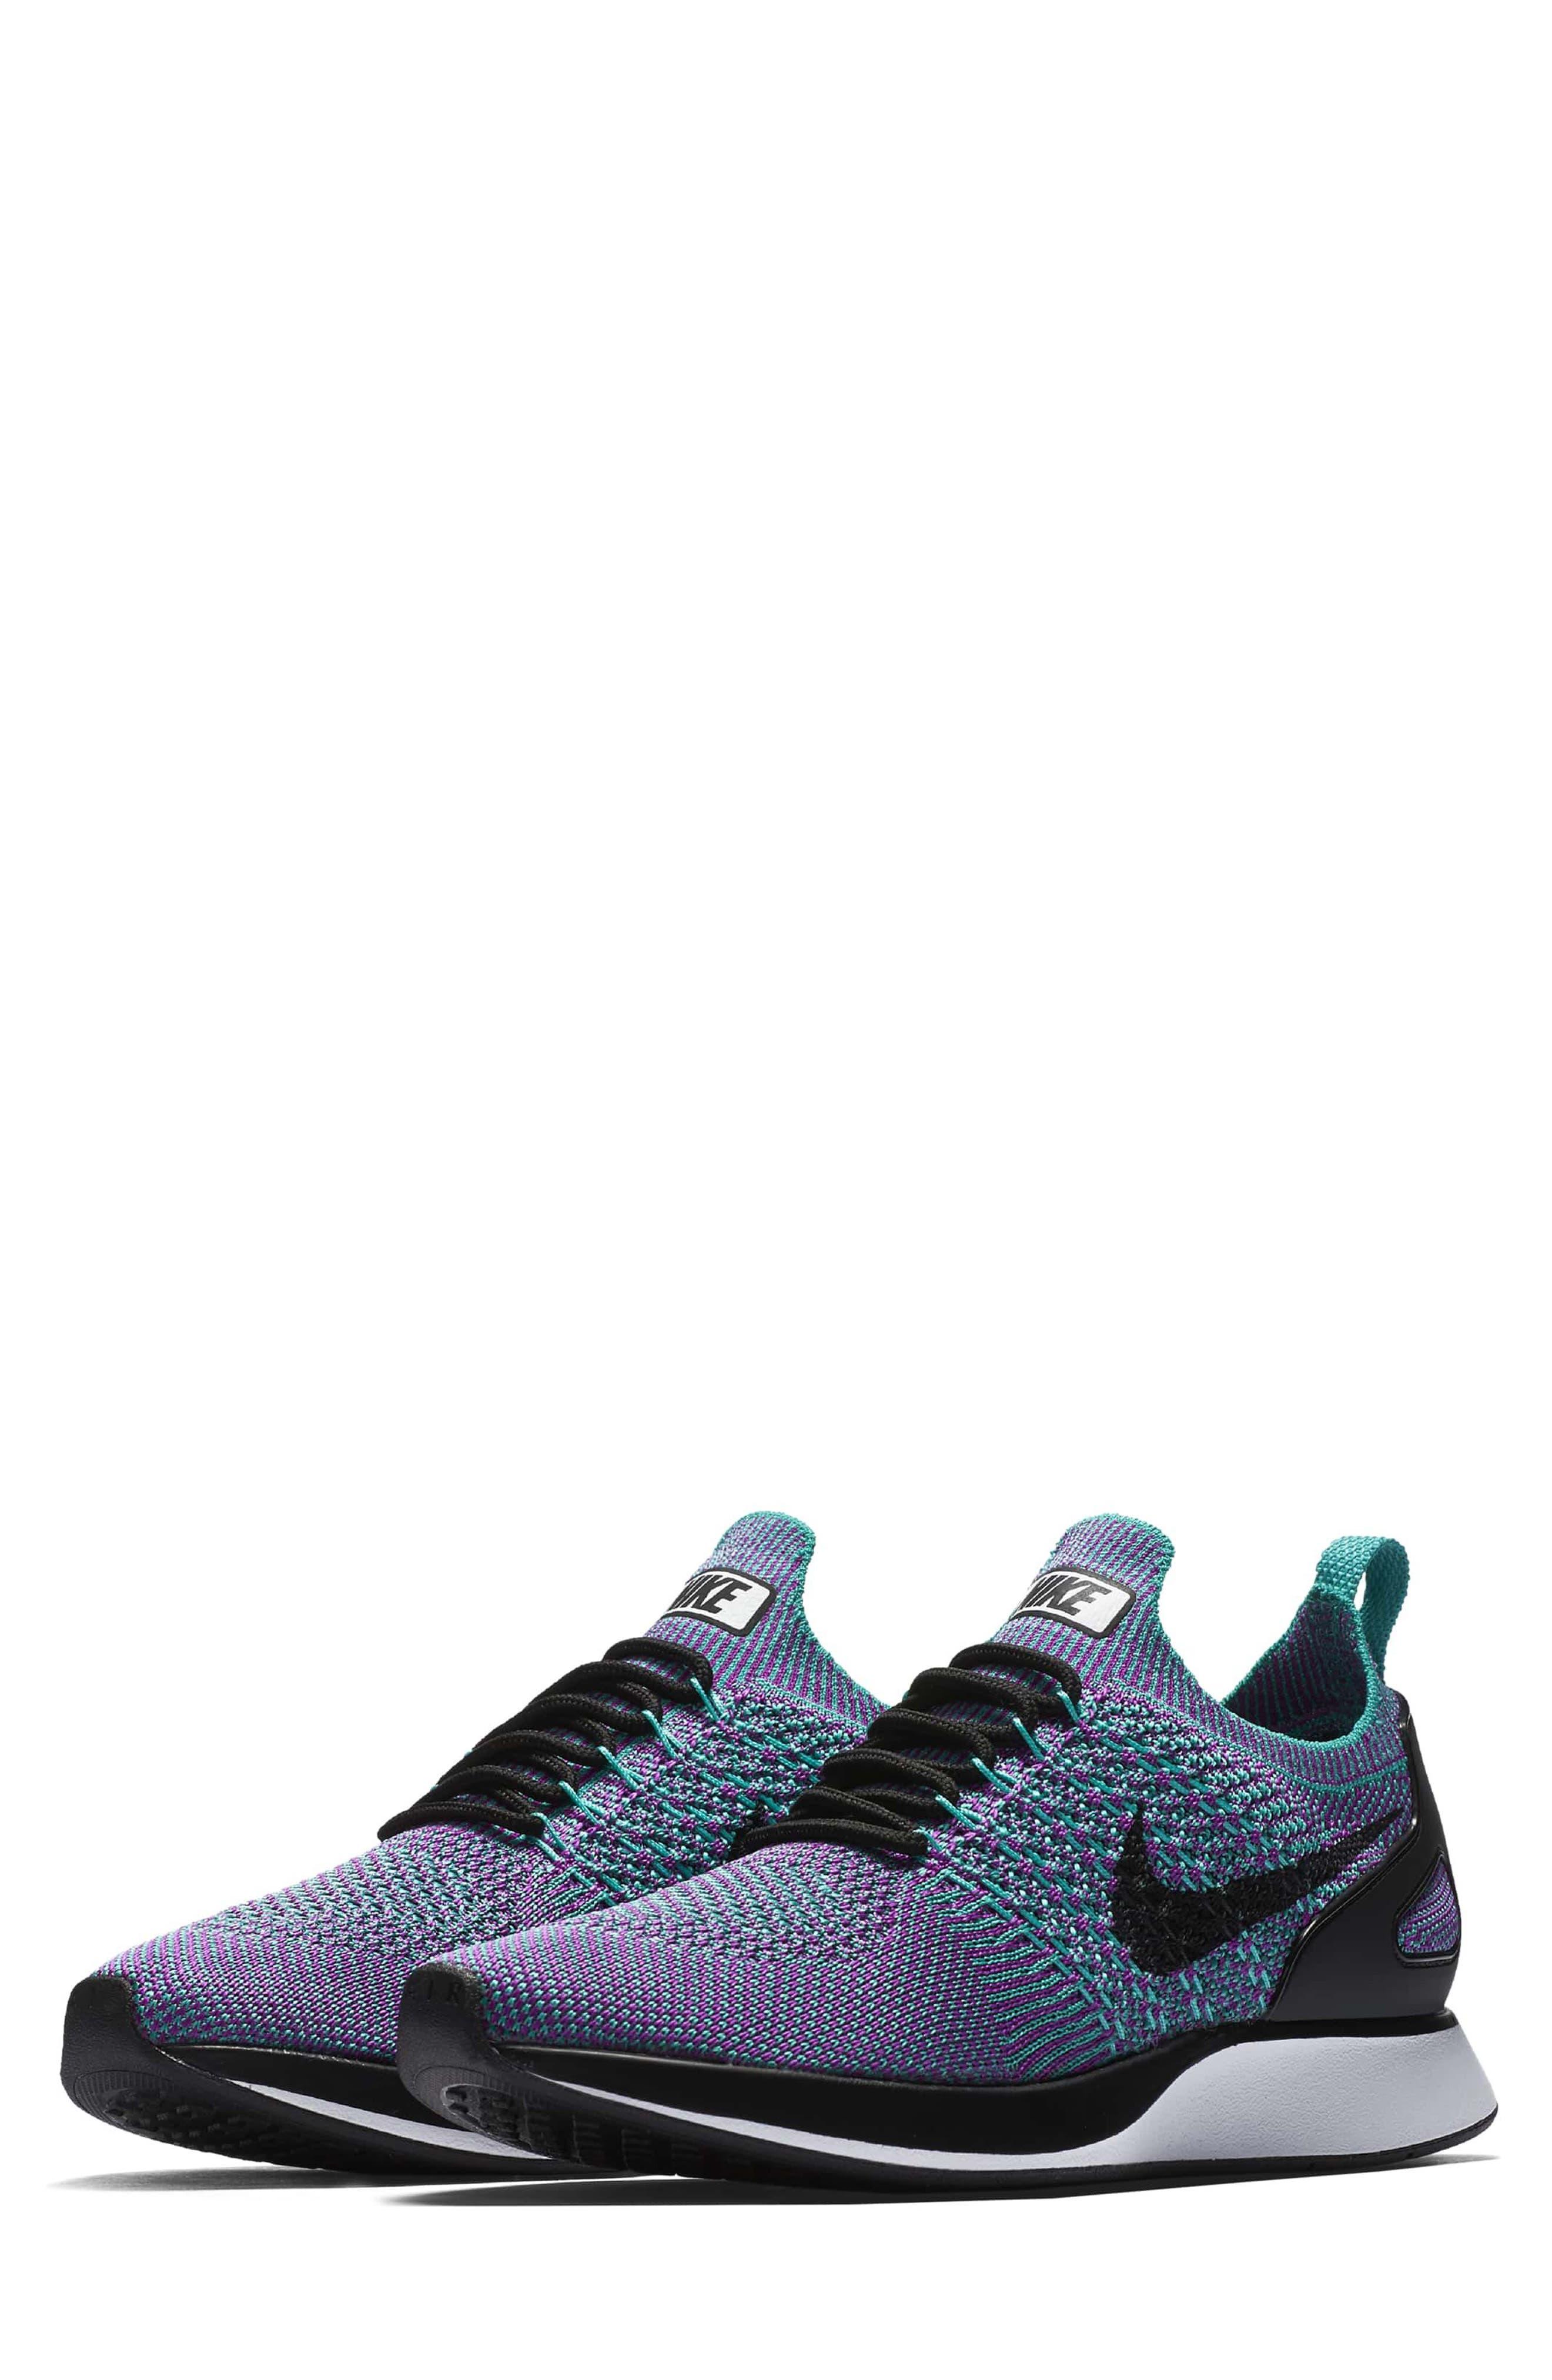 Main Image - Nike Air Zoom Mariah Flyknit Racer Sneaker (Women)